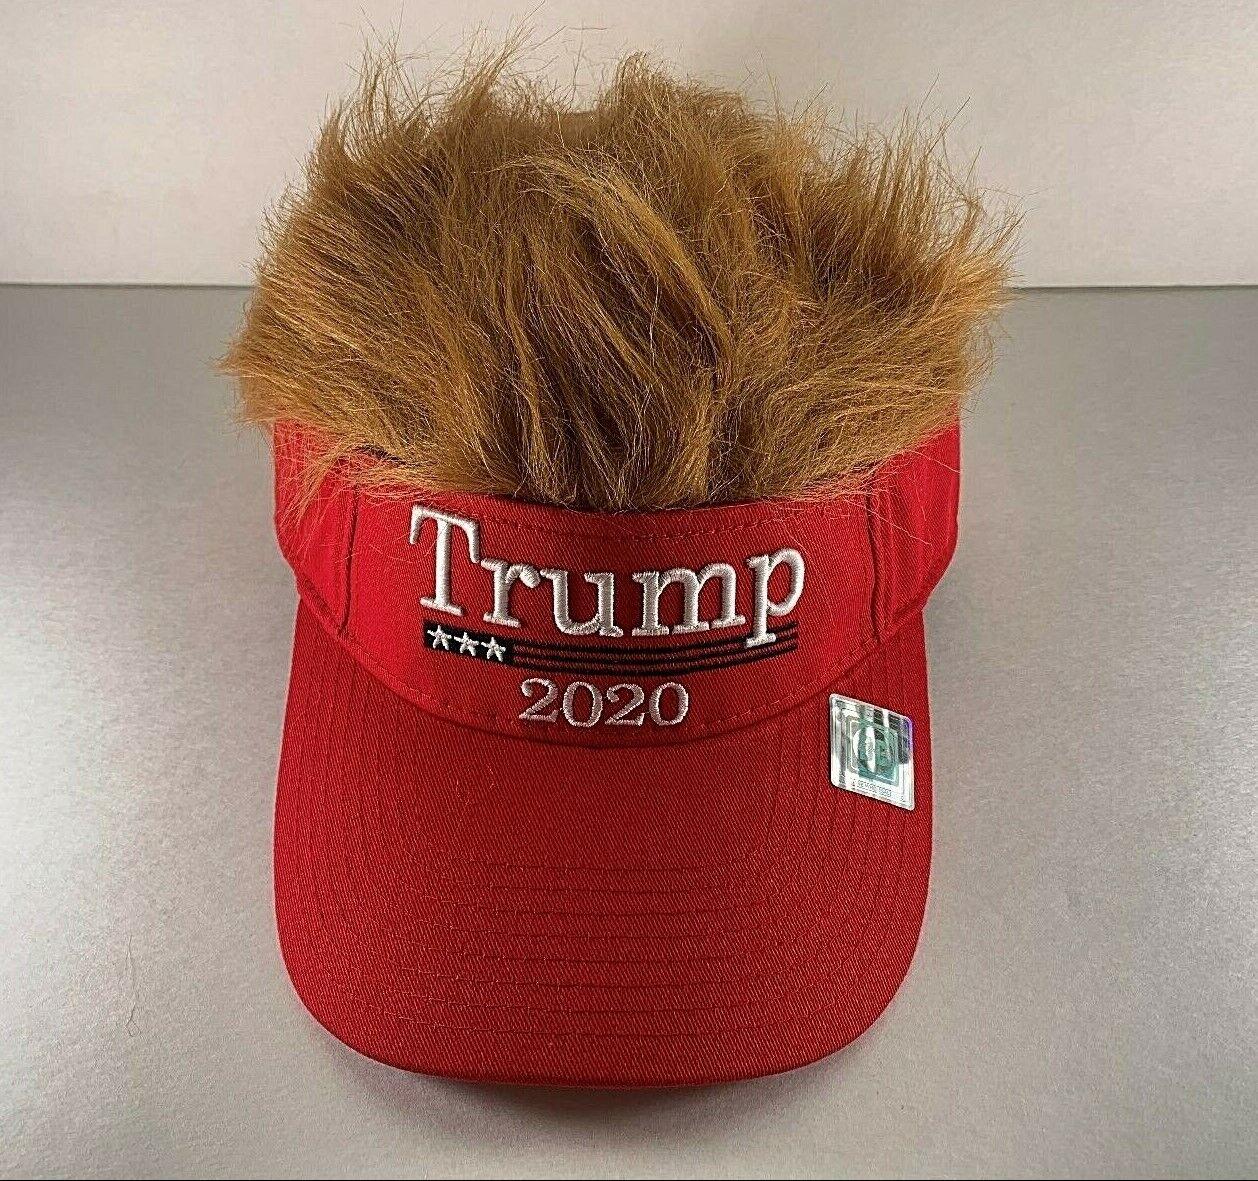 Donald Trump 2020 Wig Visor Hat Keep America Great USA Campaign Baseball Cap